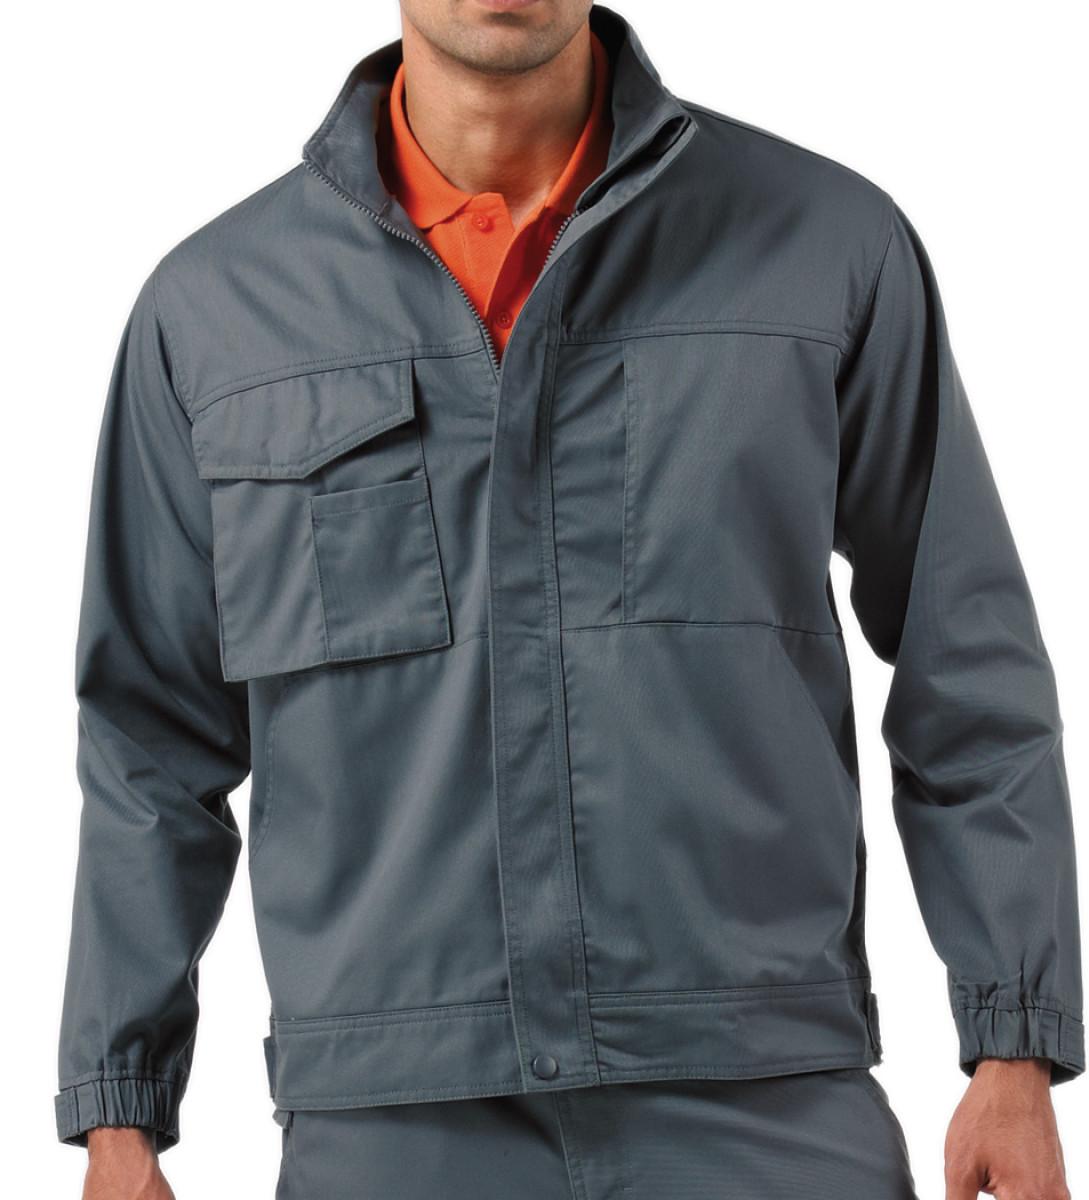 Polycotton Twill Jacket